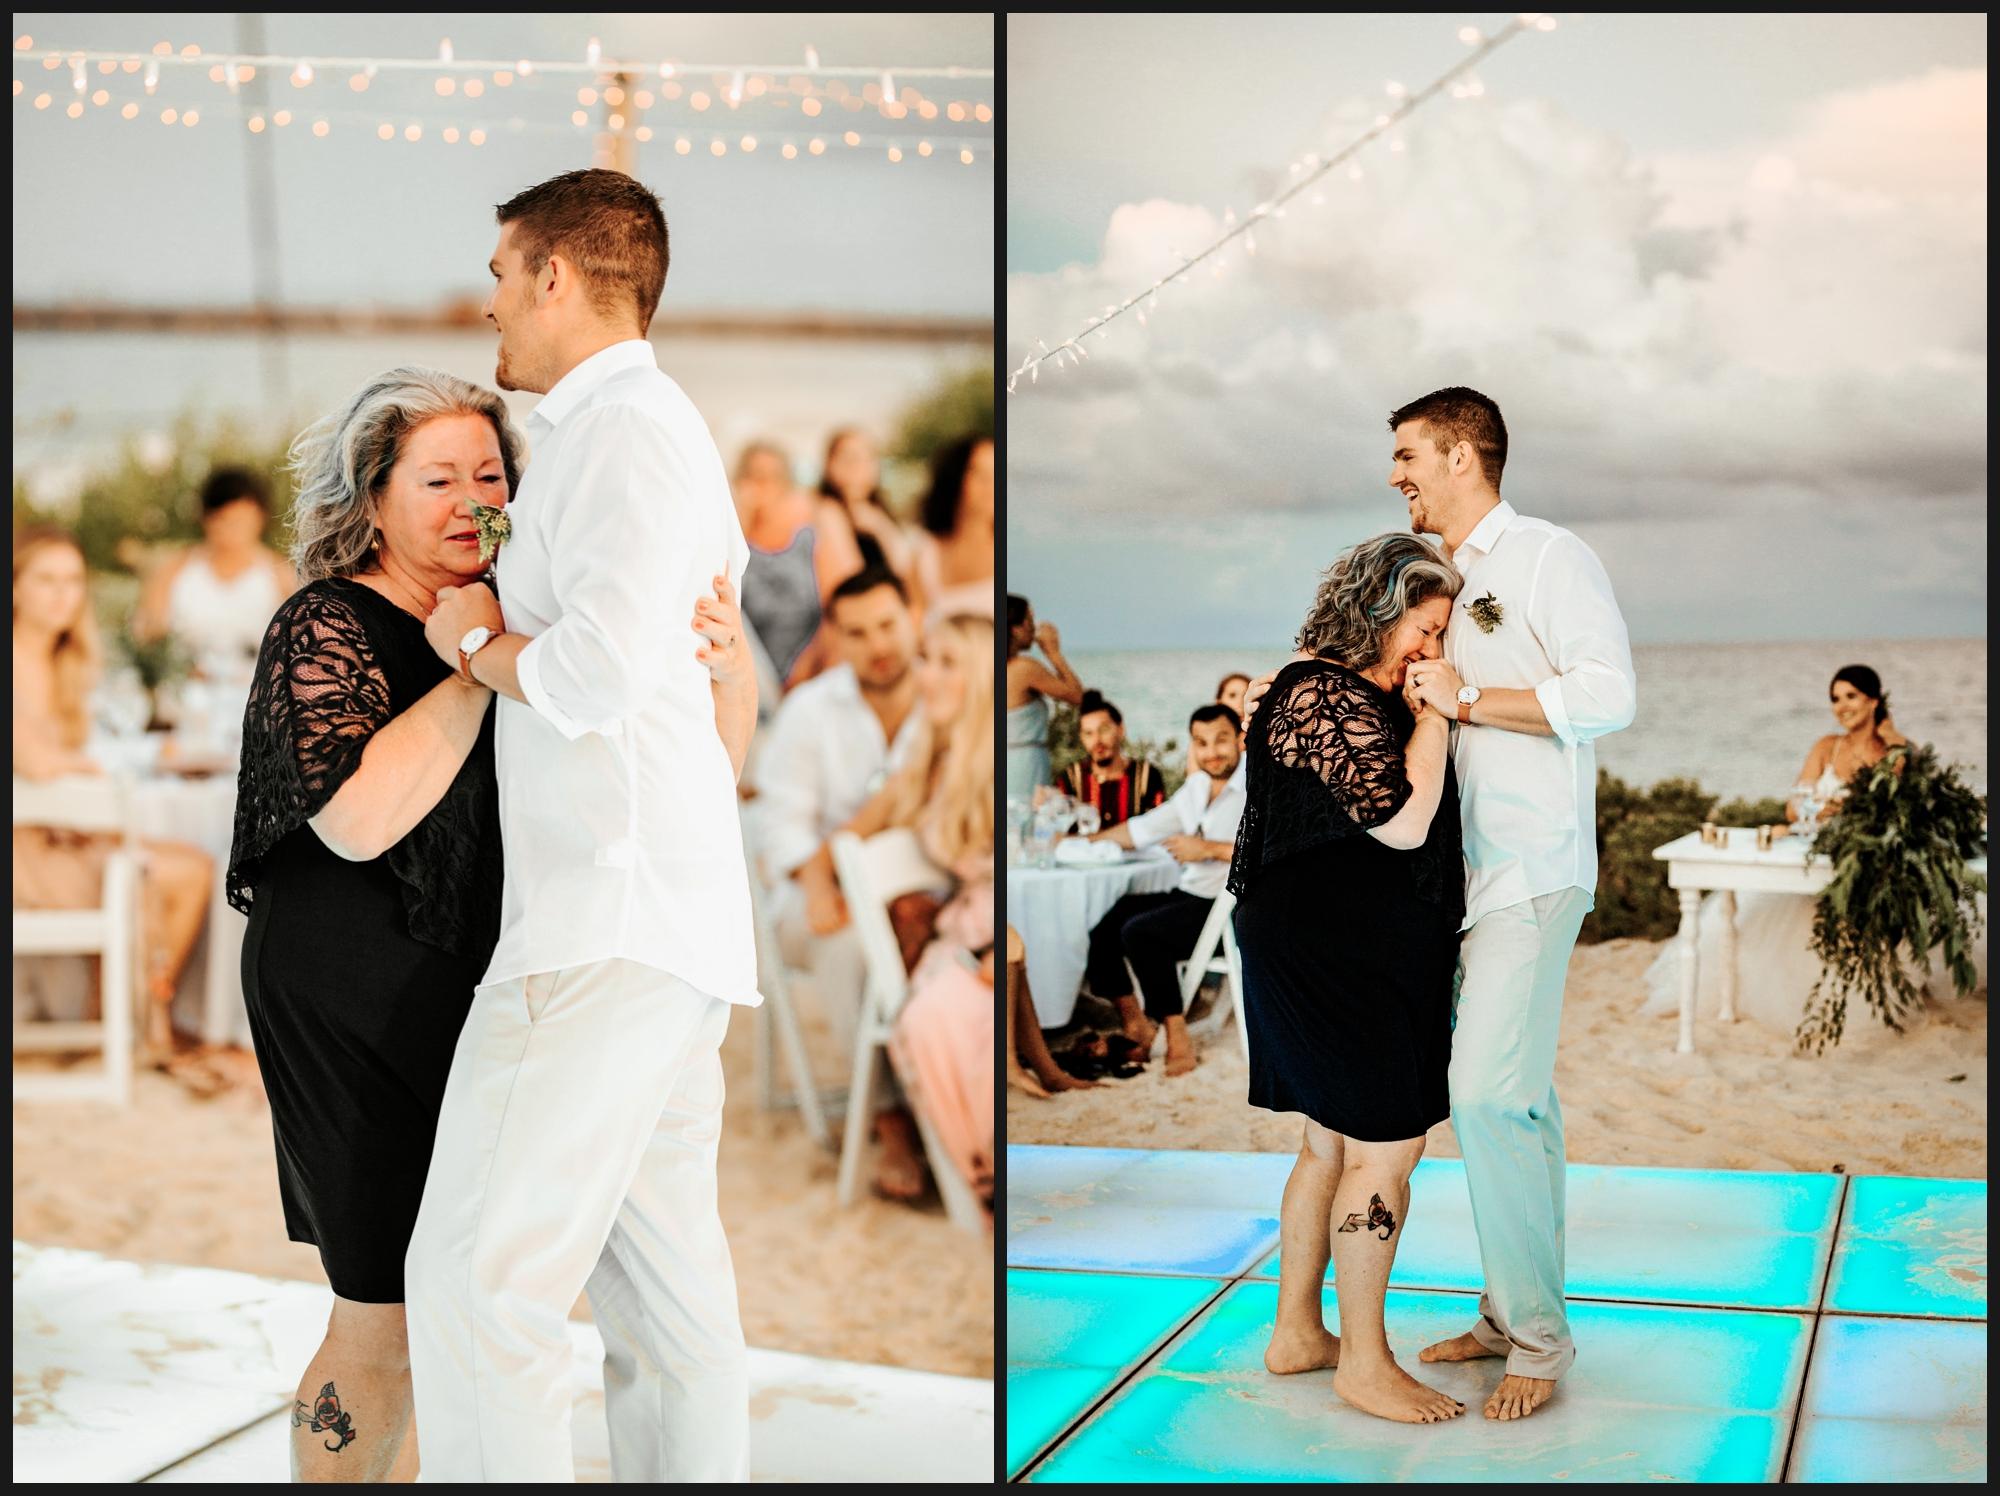 Orlando-Wedding-Photographer-destination-wedding-photographer-florida-wedding-photographer-bohemian-wedding-photographer_0476.jpg